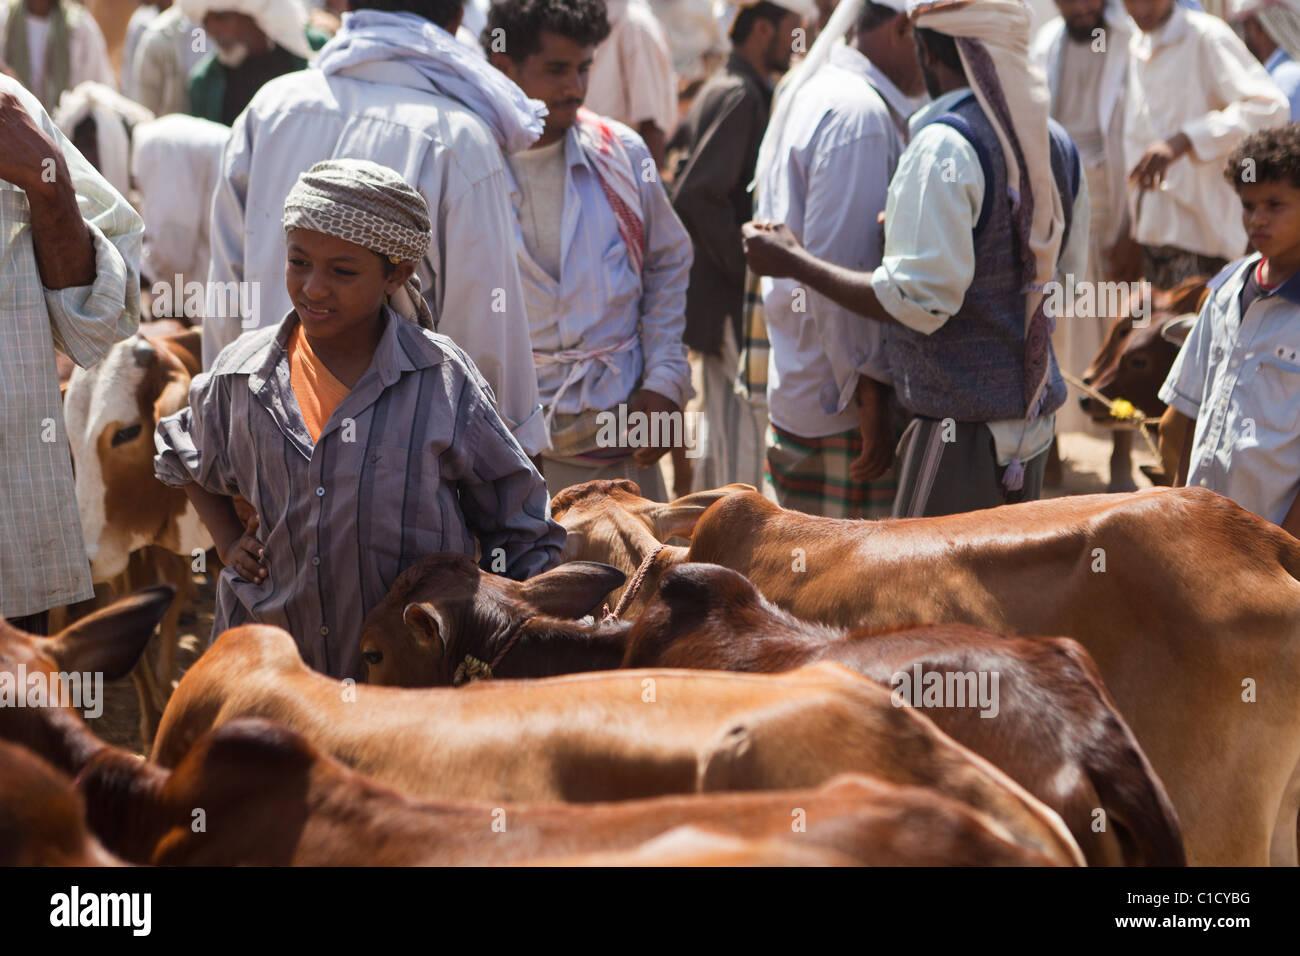 Cattle Market at Bait Al Faqih Friday Market, Yemen - Stock Image